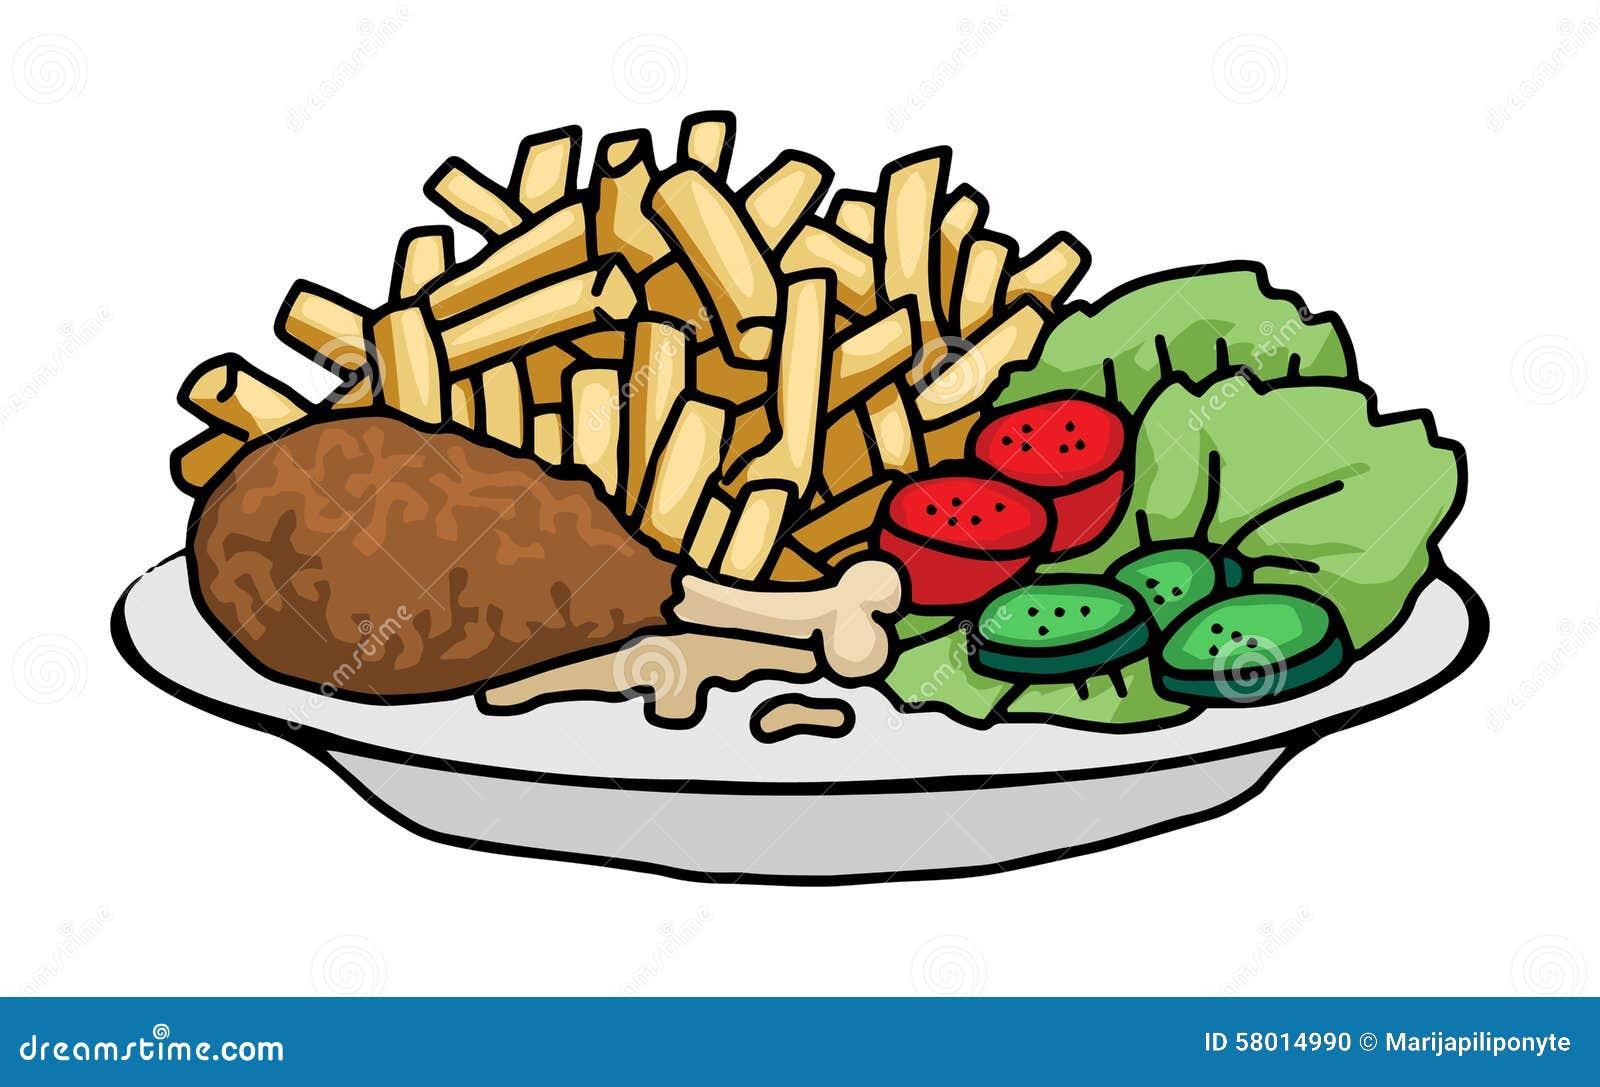 Chicken Chips Stock Illustrations – 922 Chicken Chips ...